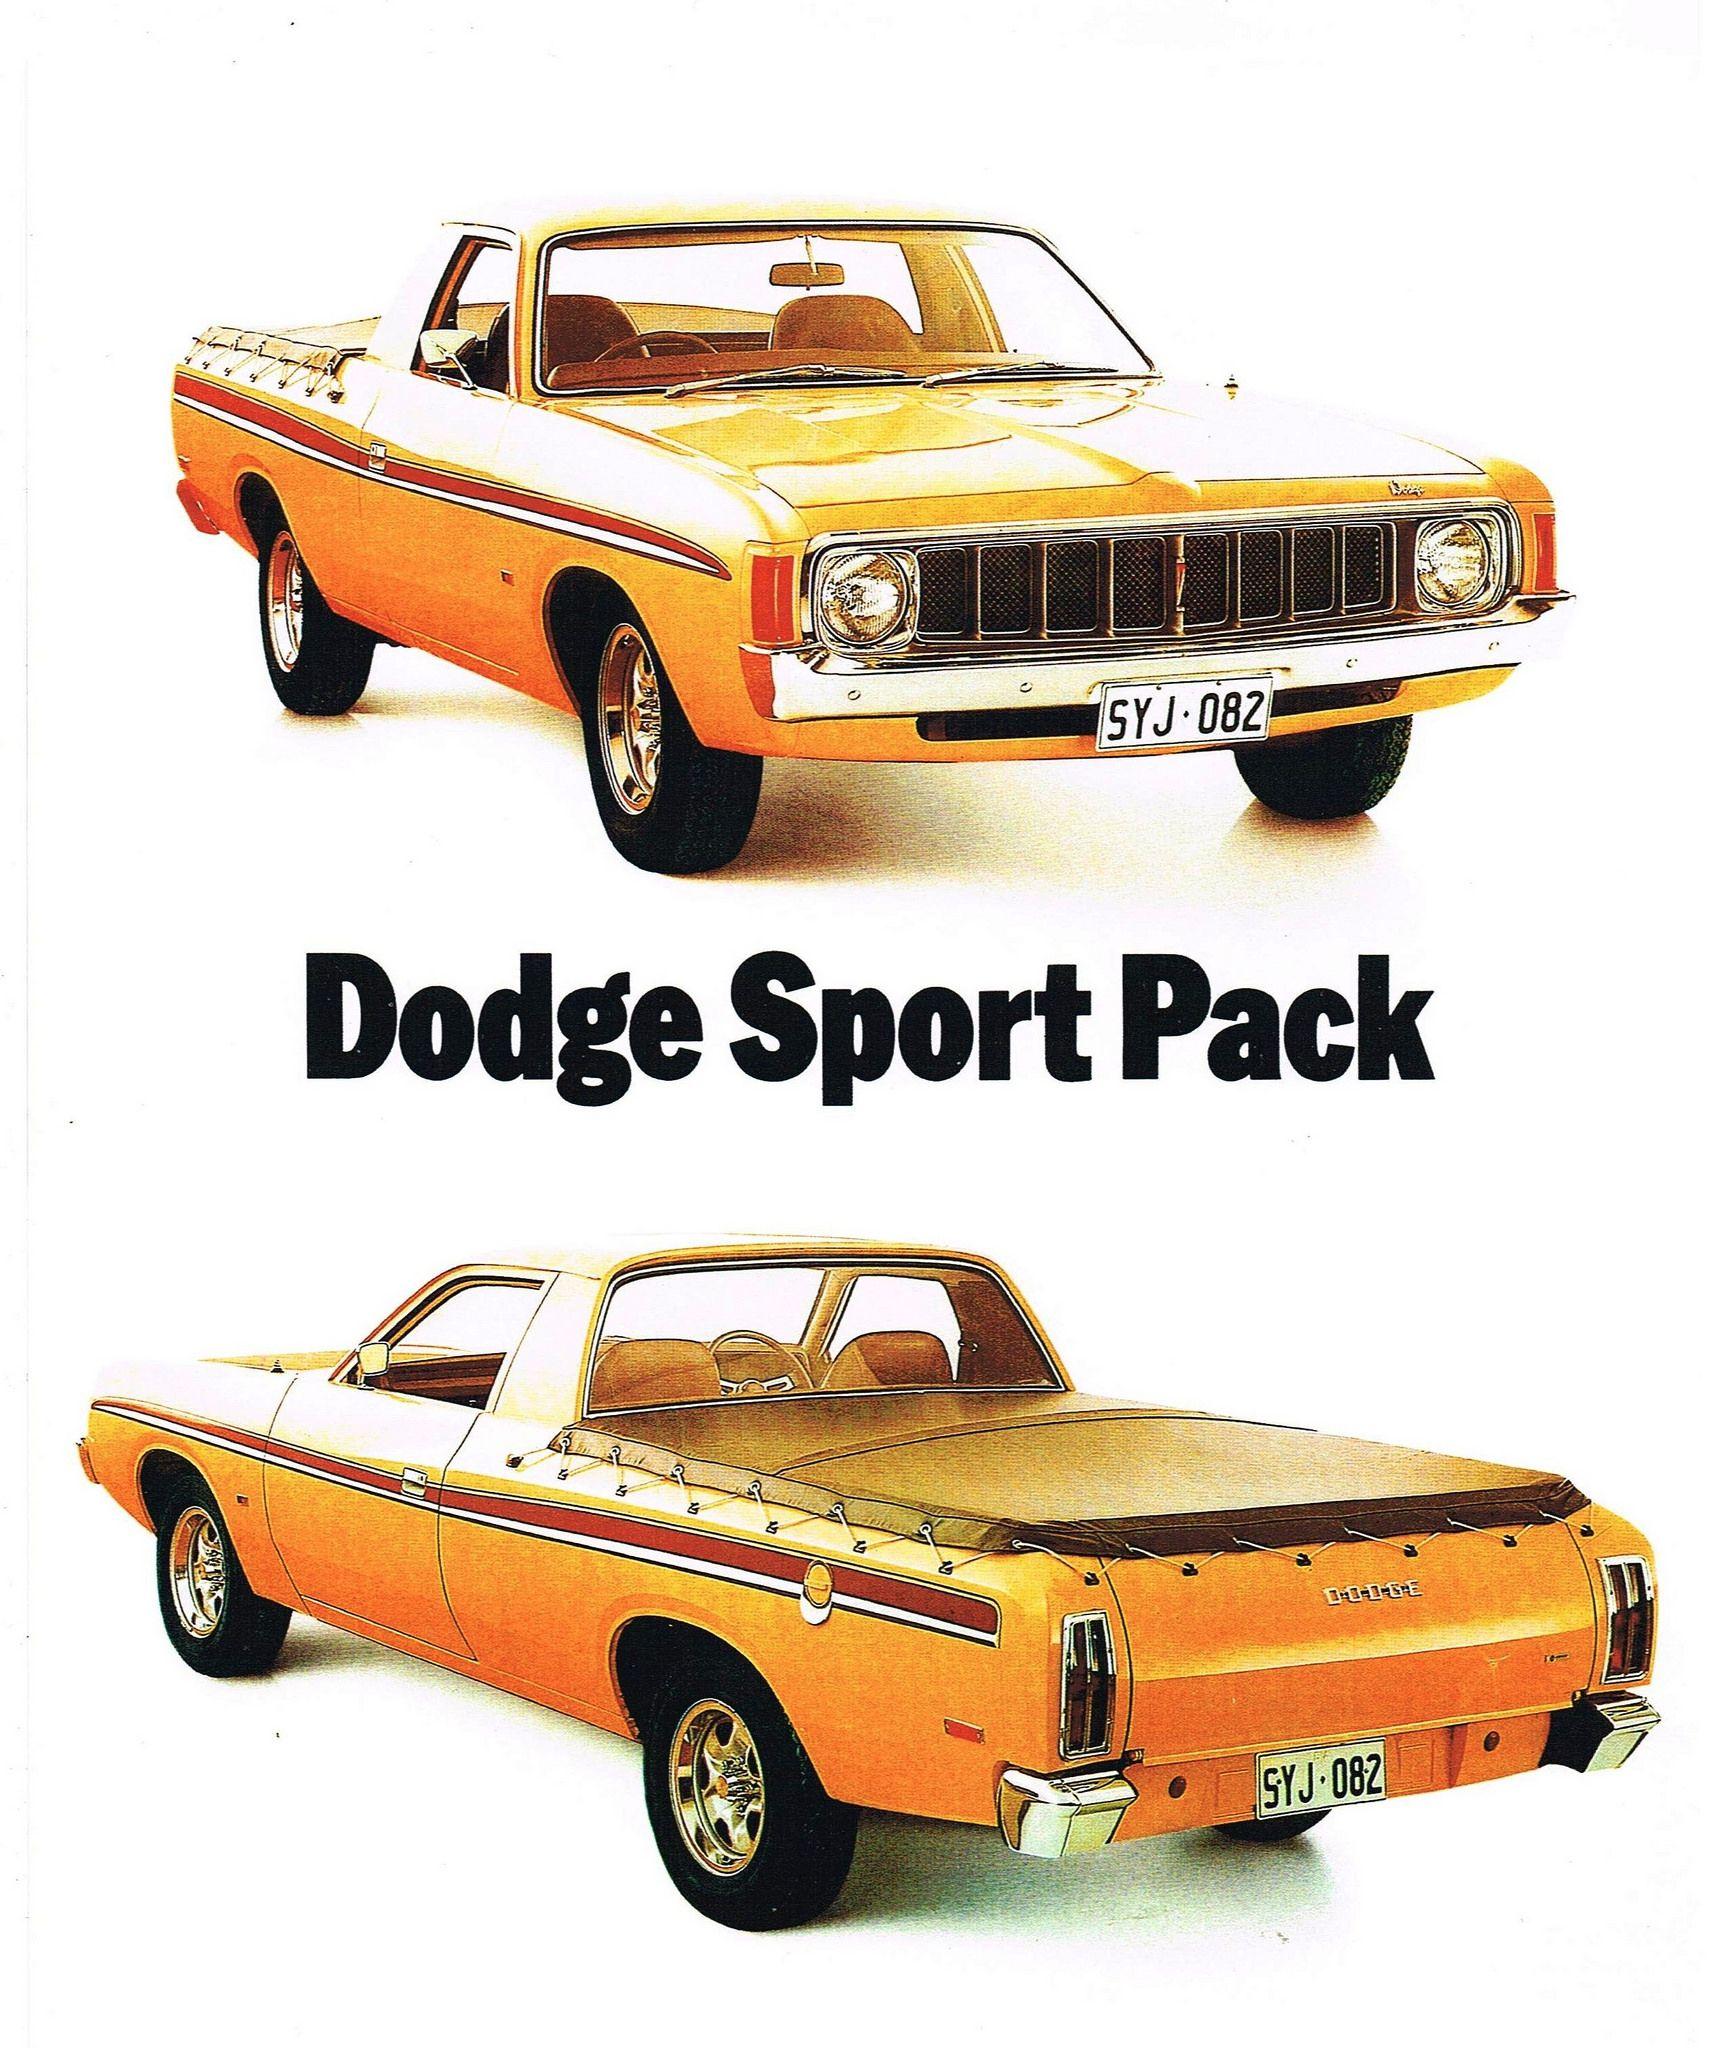 VK Dodge Sportspack | Ute, Mopar and Cars